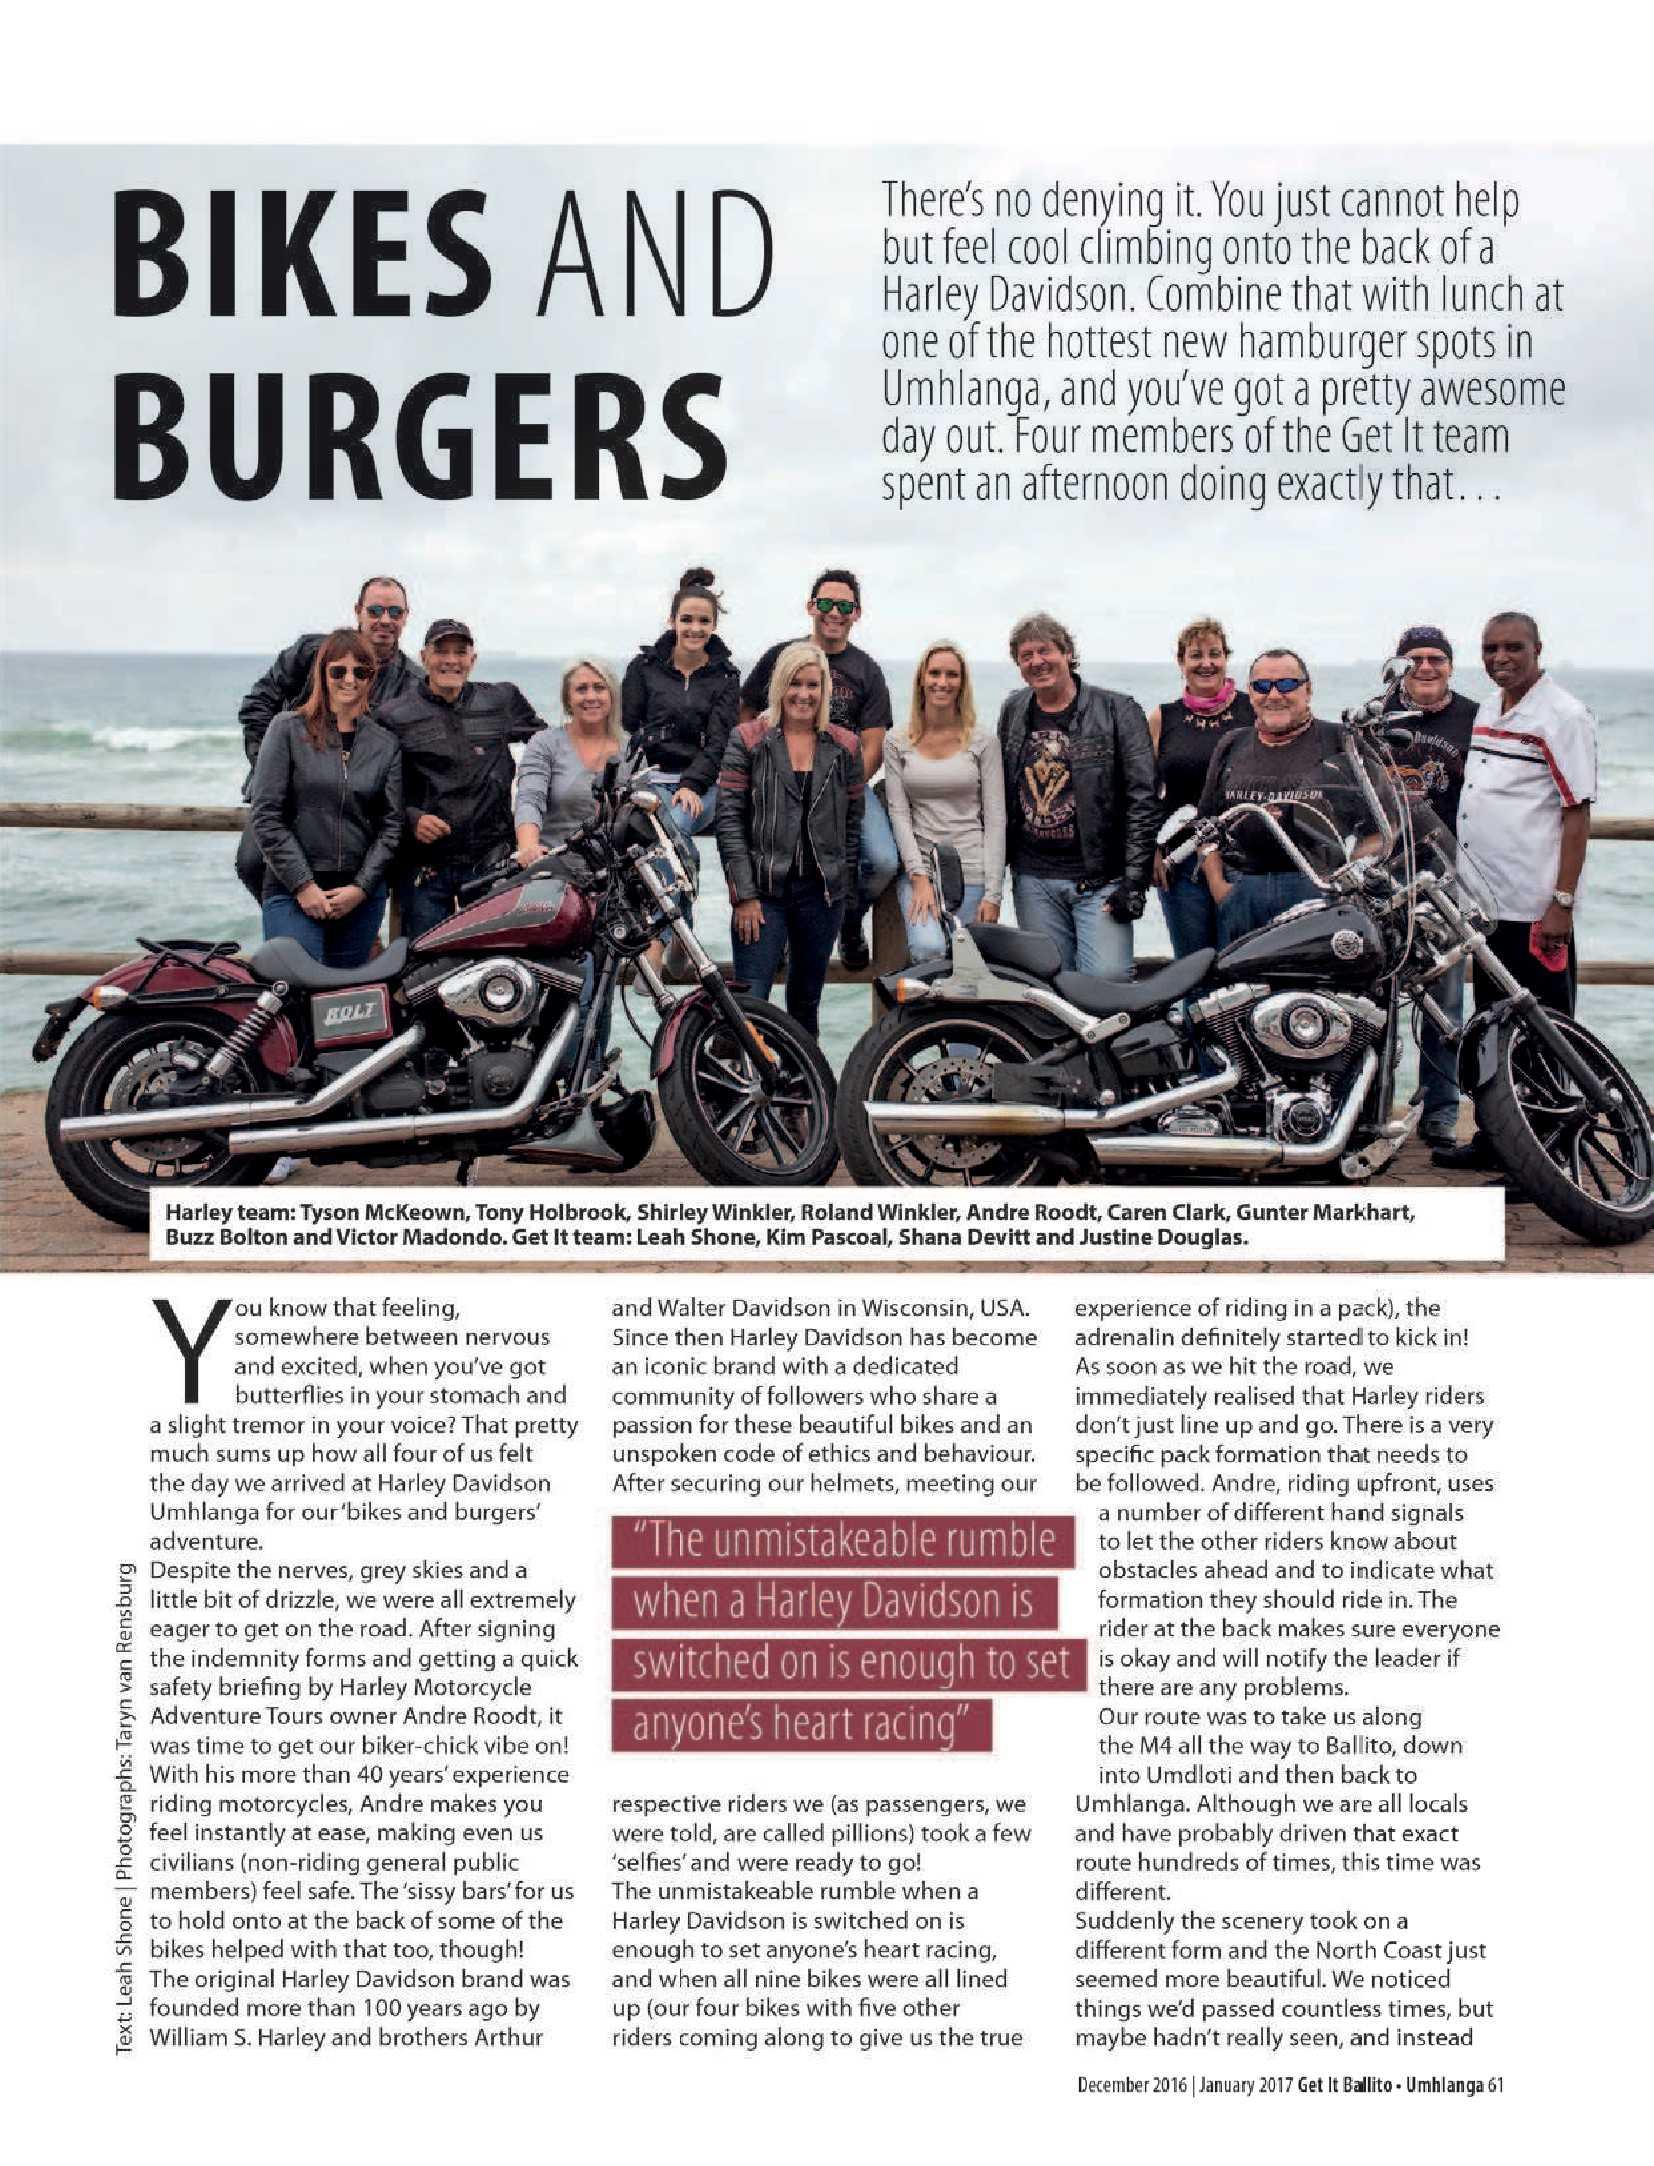 get-magazine-ballitoumhlanga-december-2016-january-2017-epapers-page-63